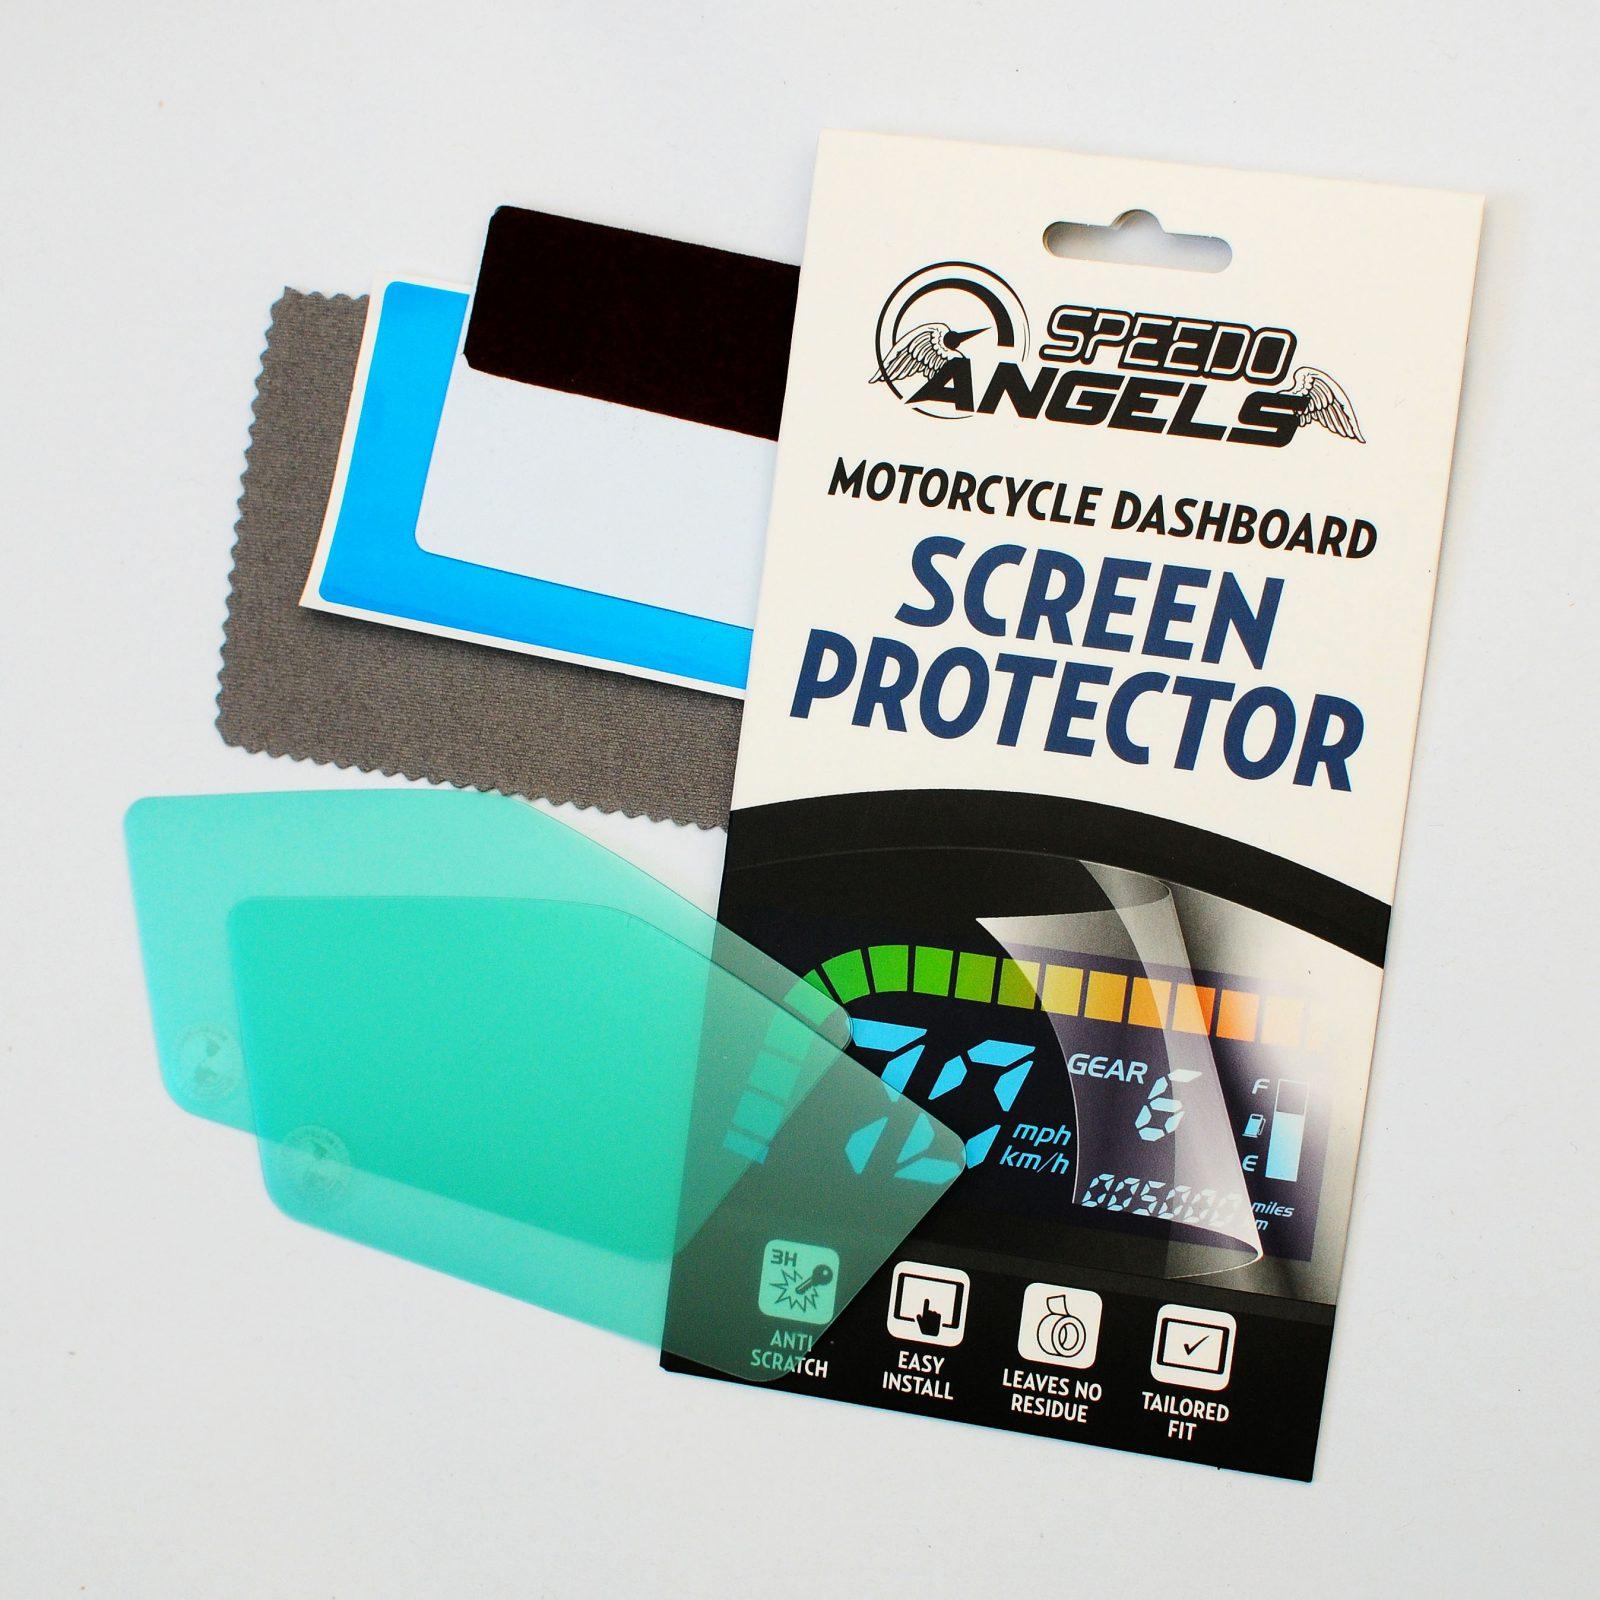 Ducati Streetfighter Screen Protector Kit